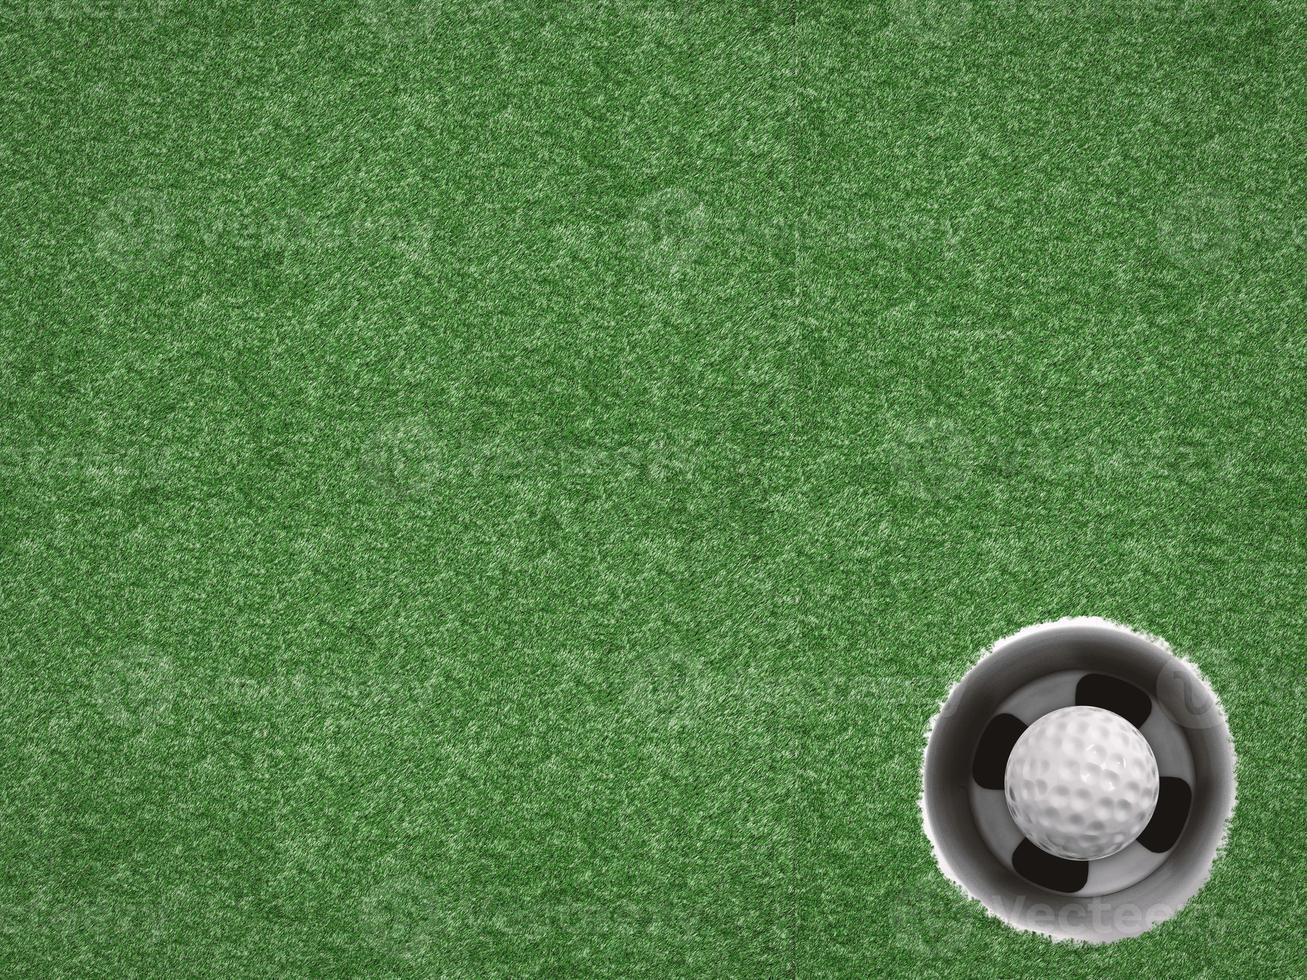 pelota de golf en copa de golf en verde foto